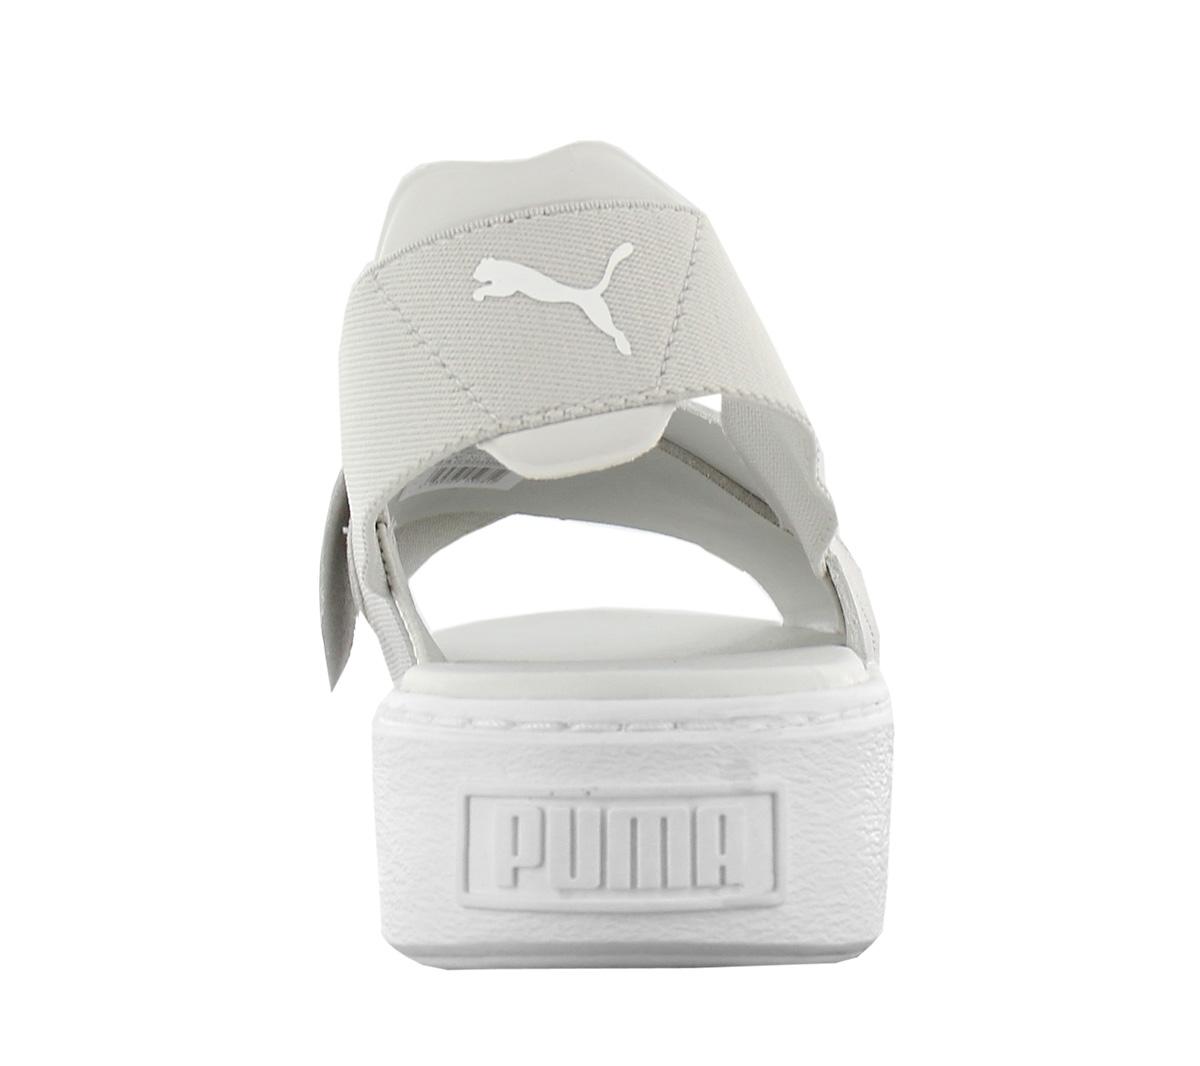 6c018c36ed5537 Puma Platform Sandal Leather Women s Shoes 365481-02 New